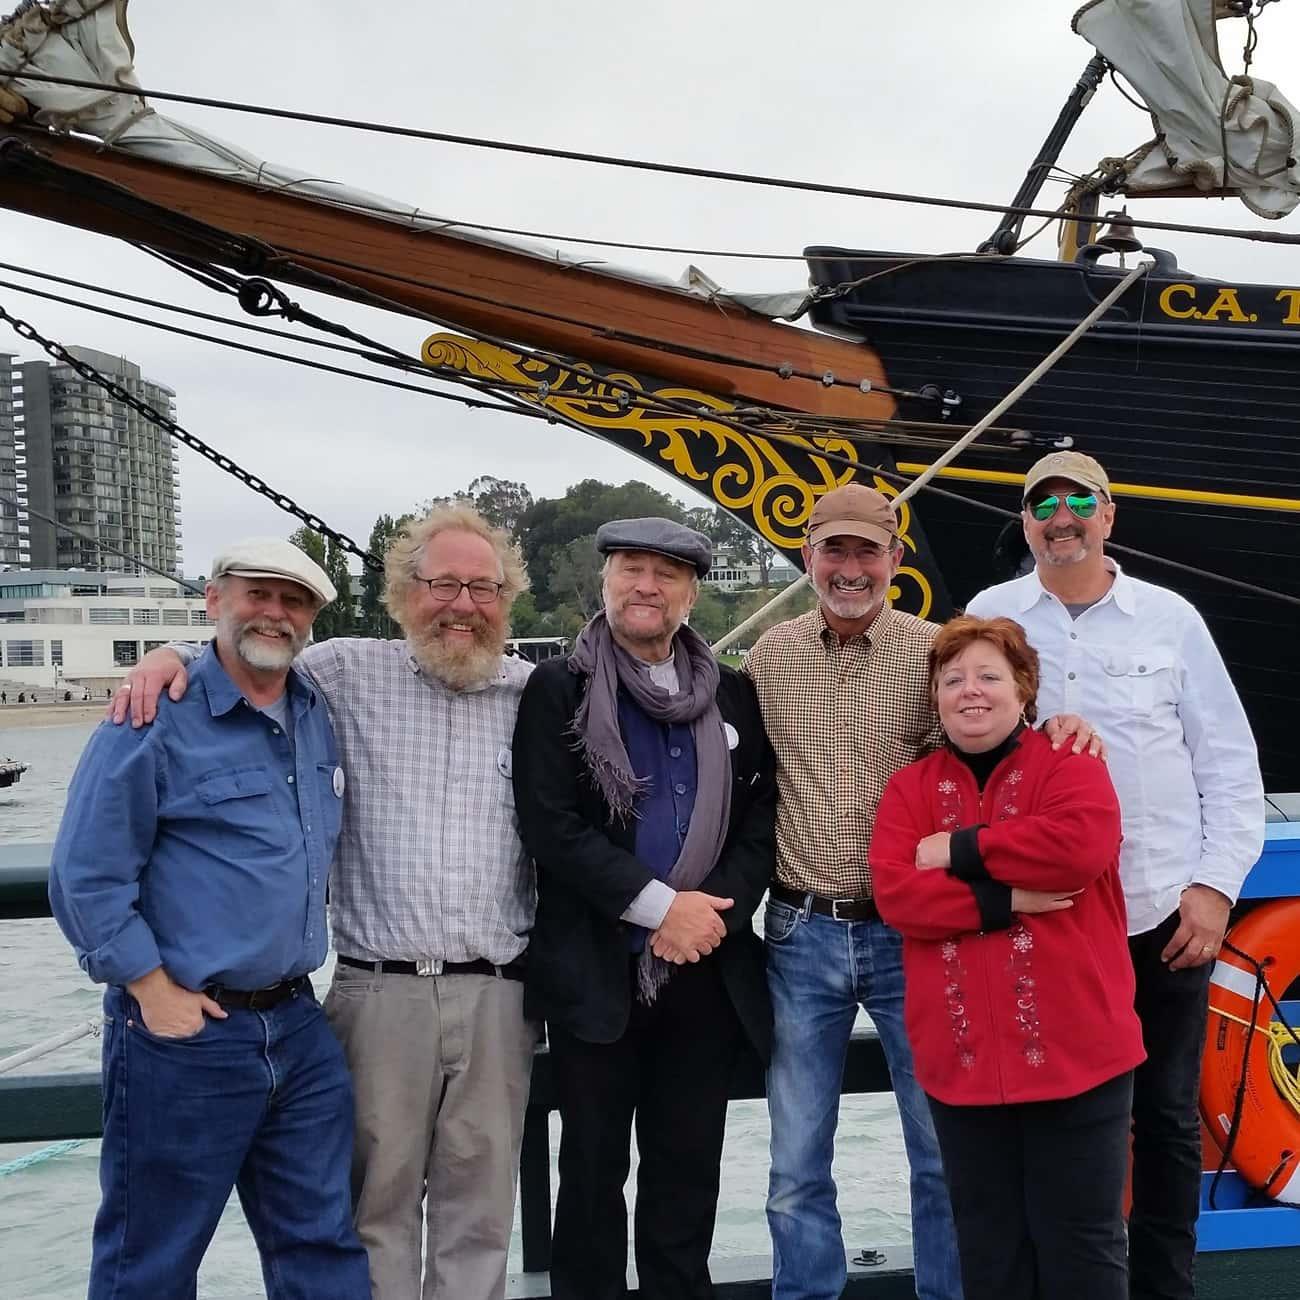 The Dogwatch Nautical Band